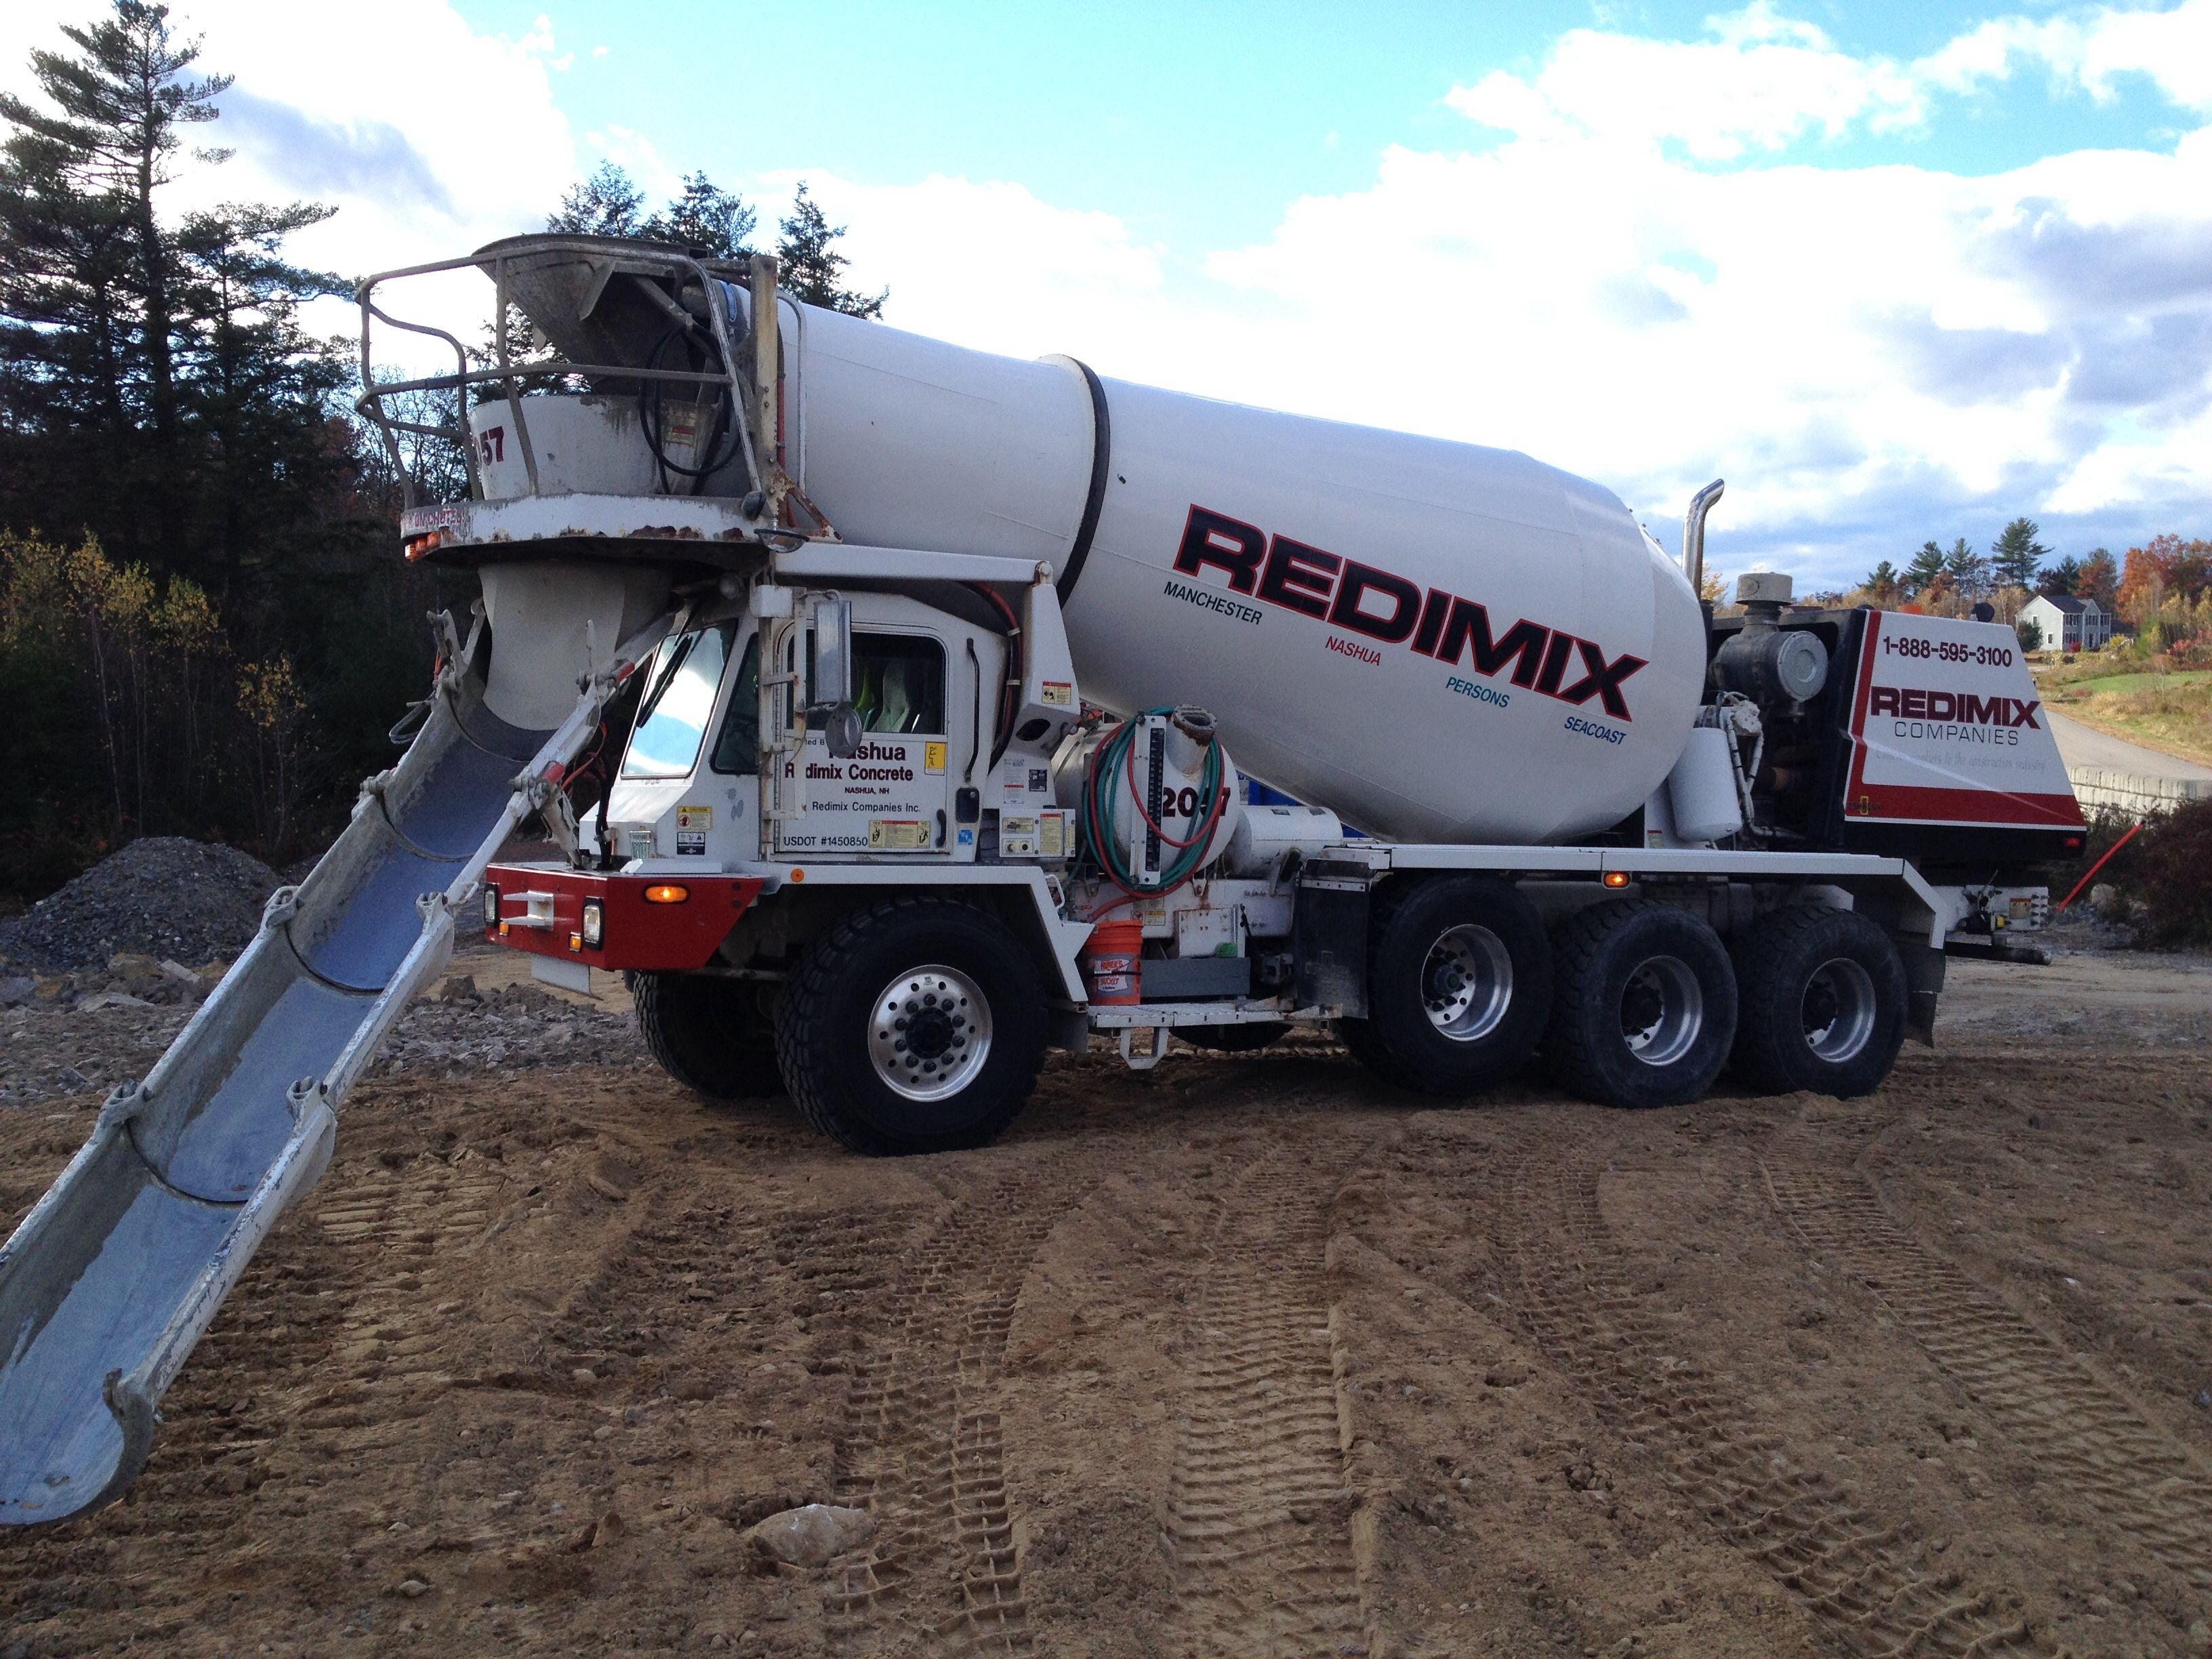 Front Load Mixer ~ Front discharge mixer ready mix trucks pinterest